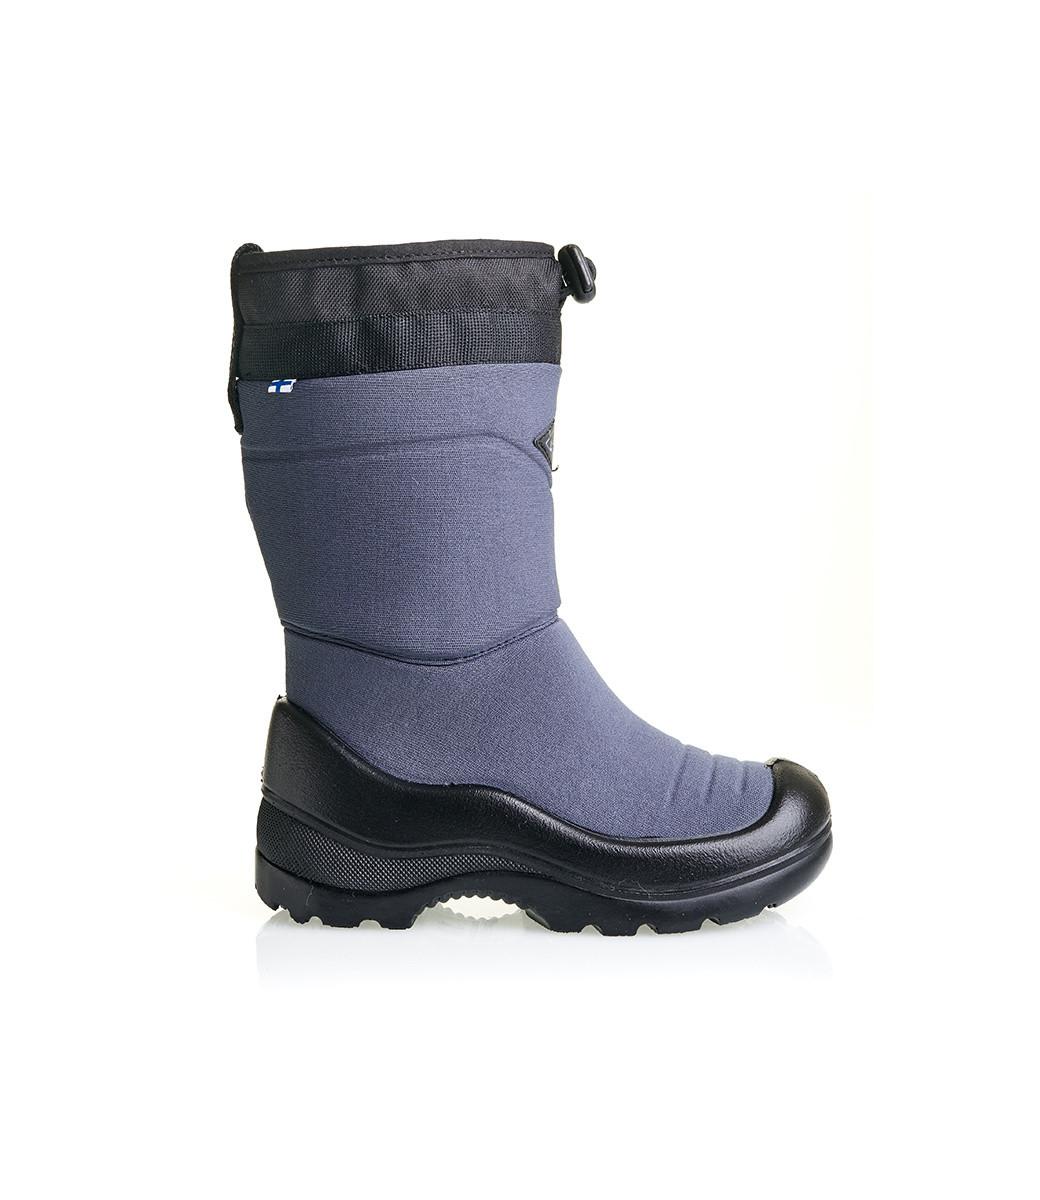 Обувь детская Kuoma Snow snowlock, Grey